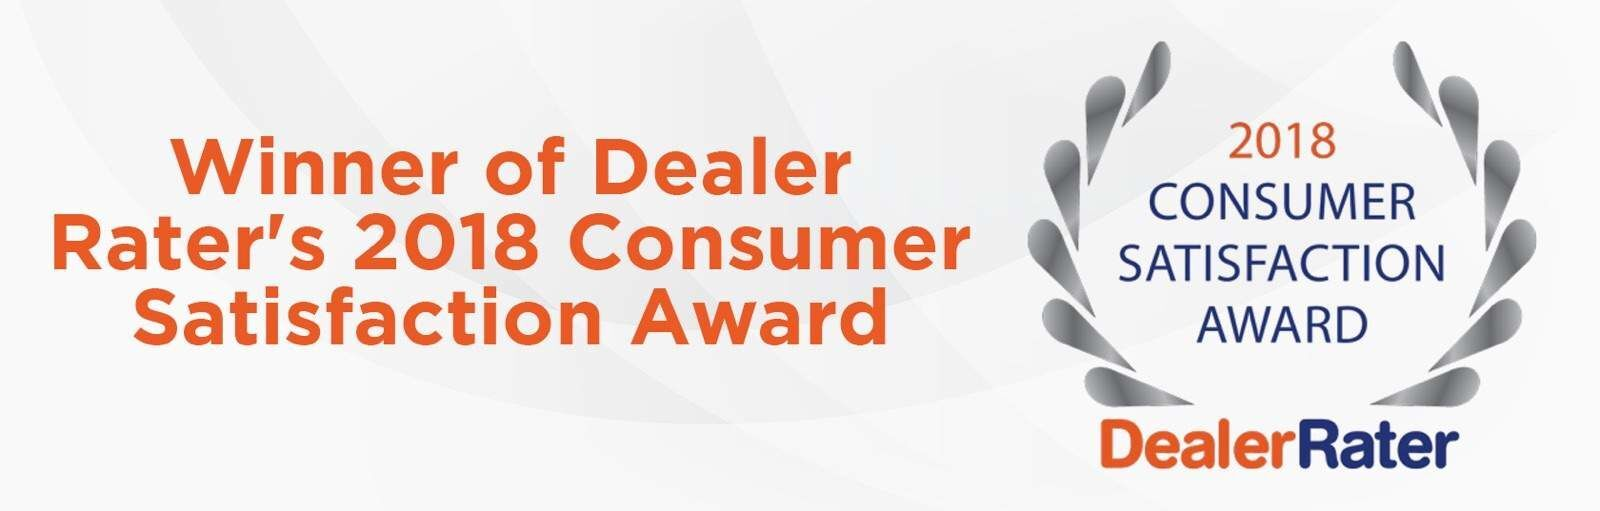 Dealer Rater's Consumer Satisfaction Award